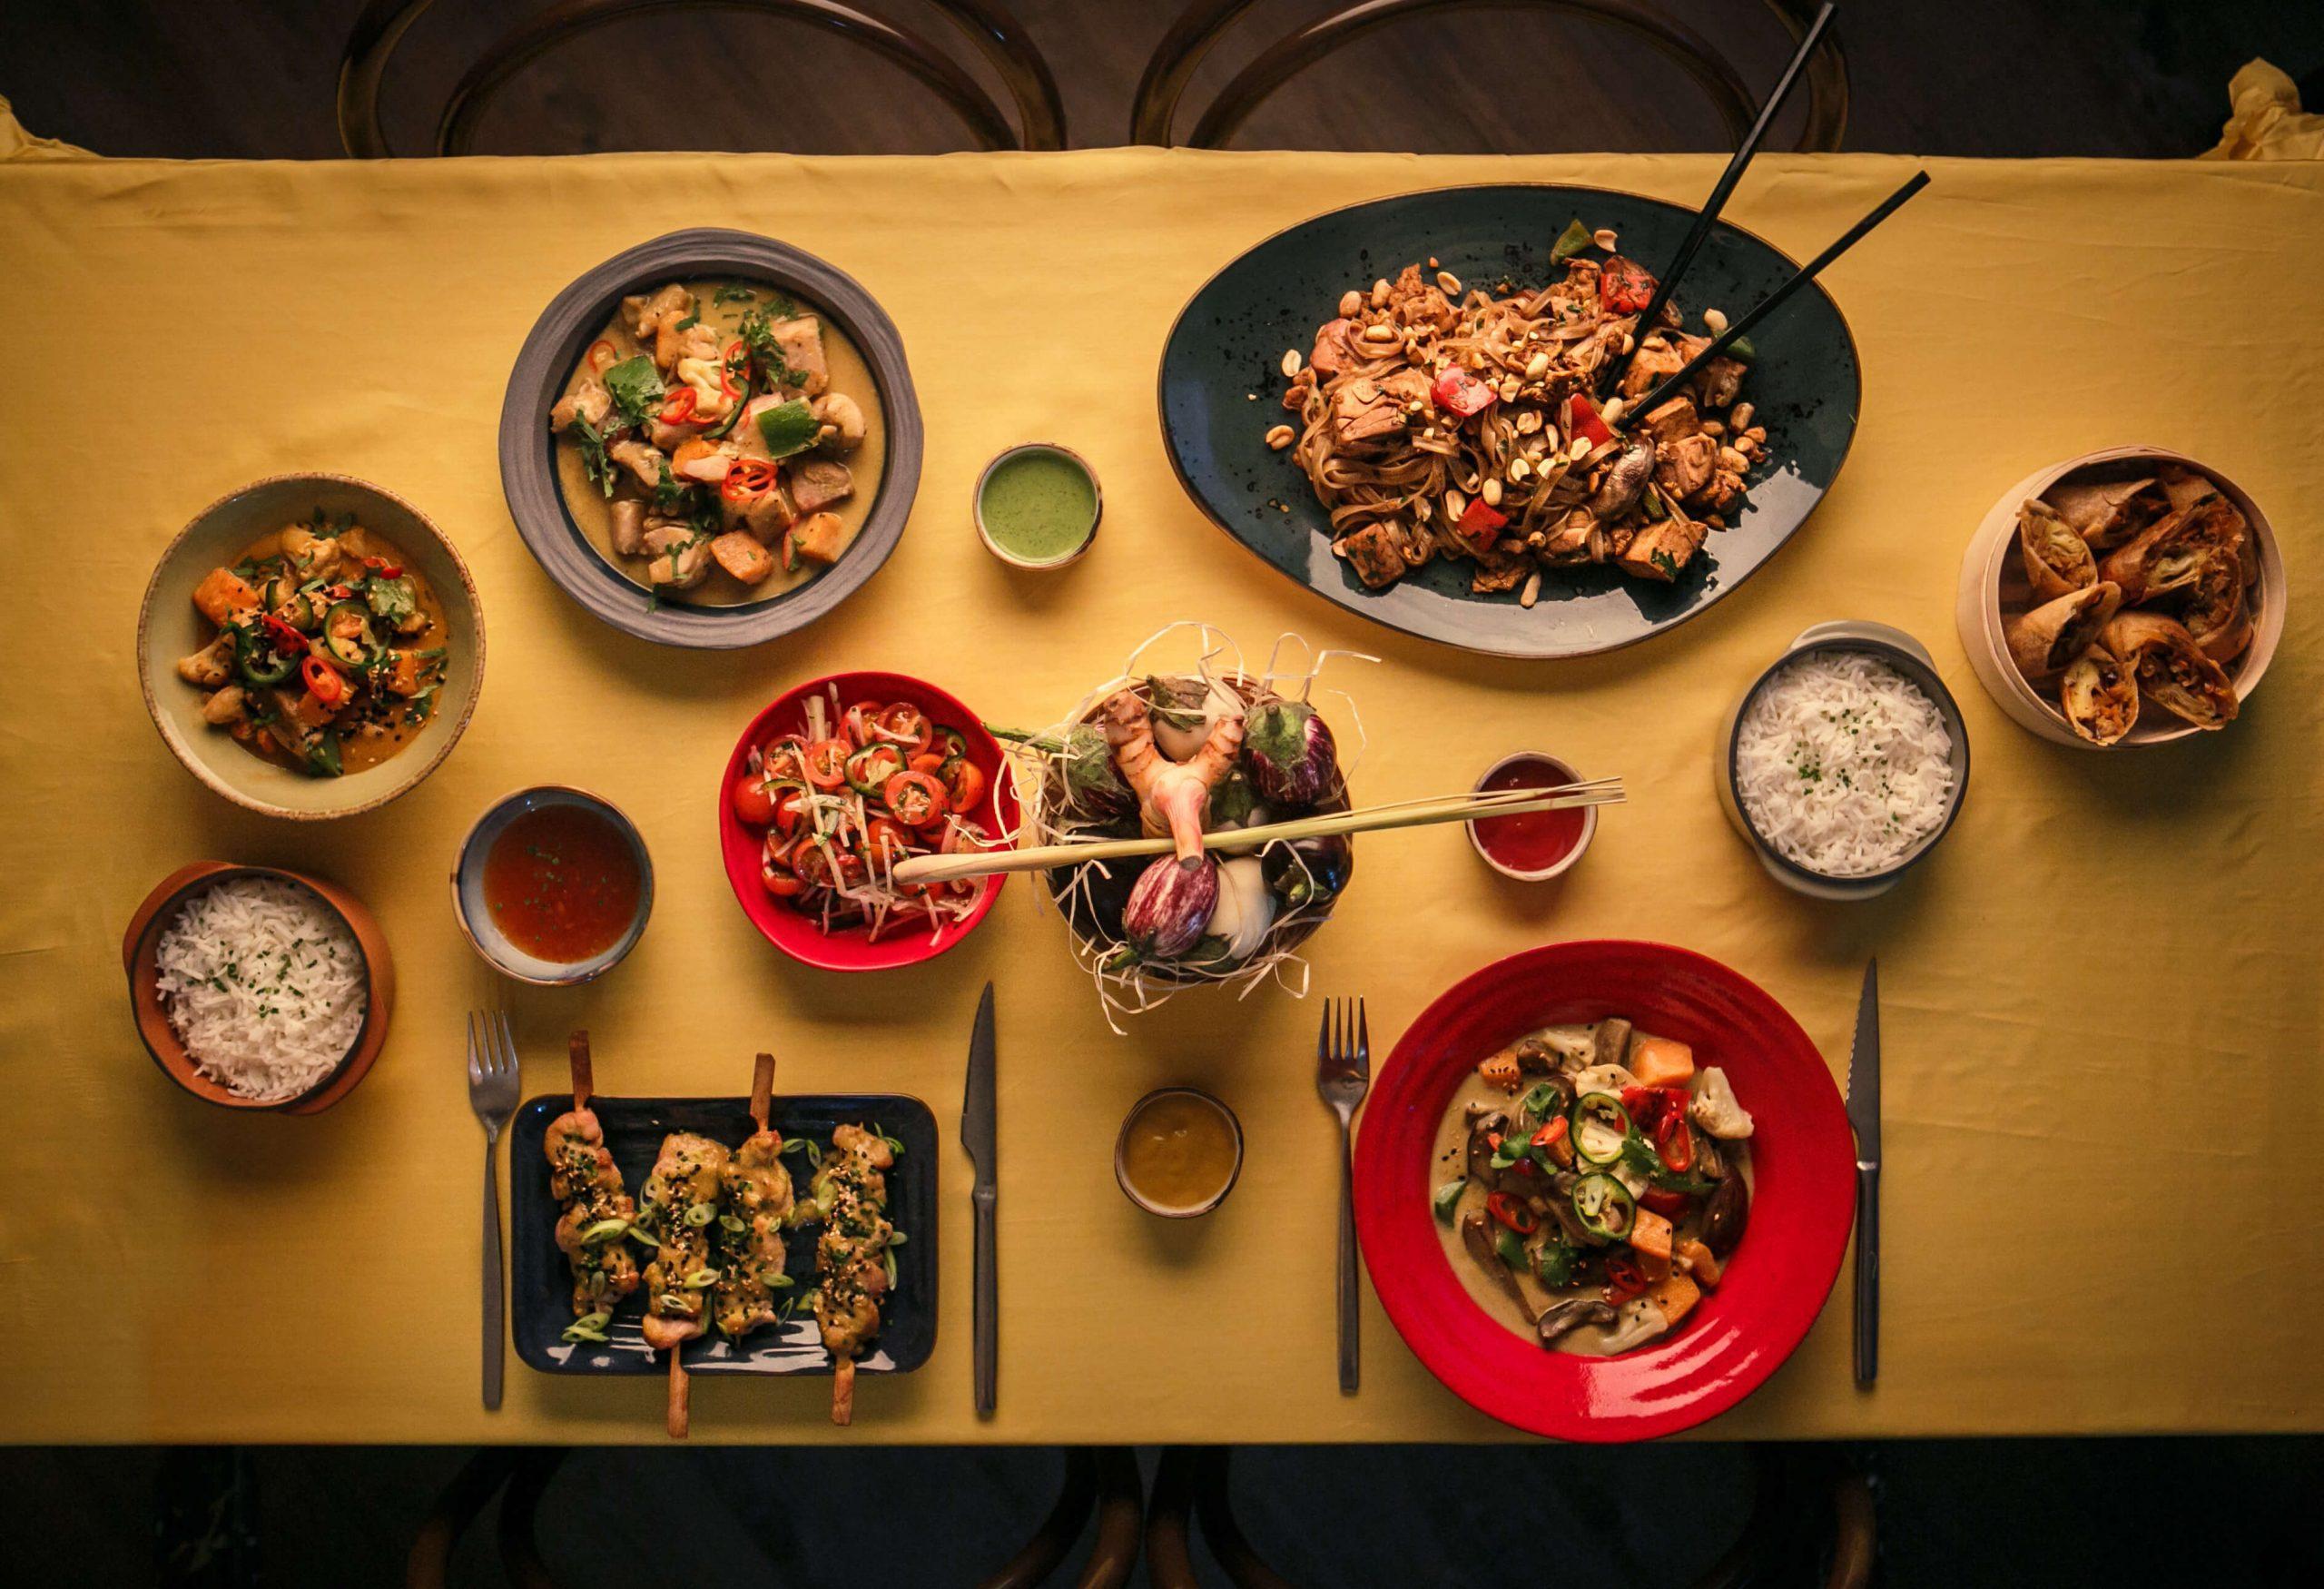 World of food - MAD-187